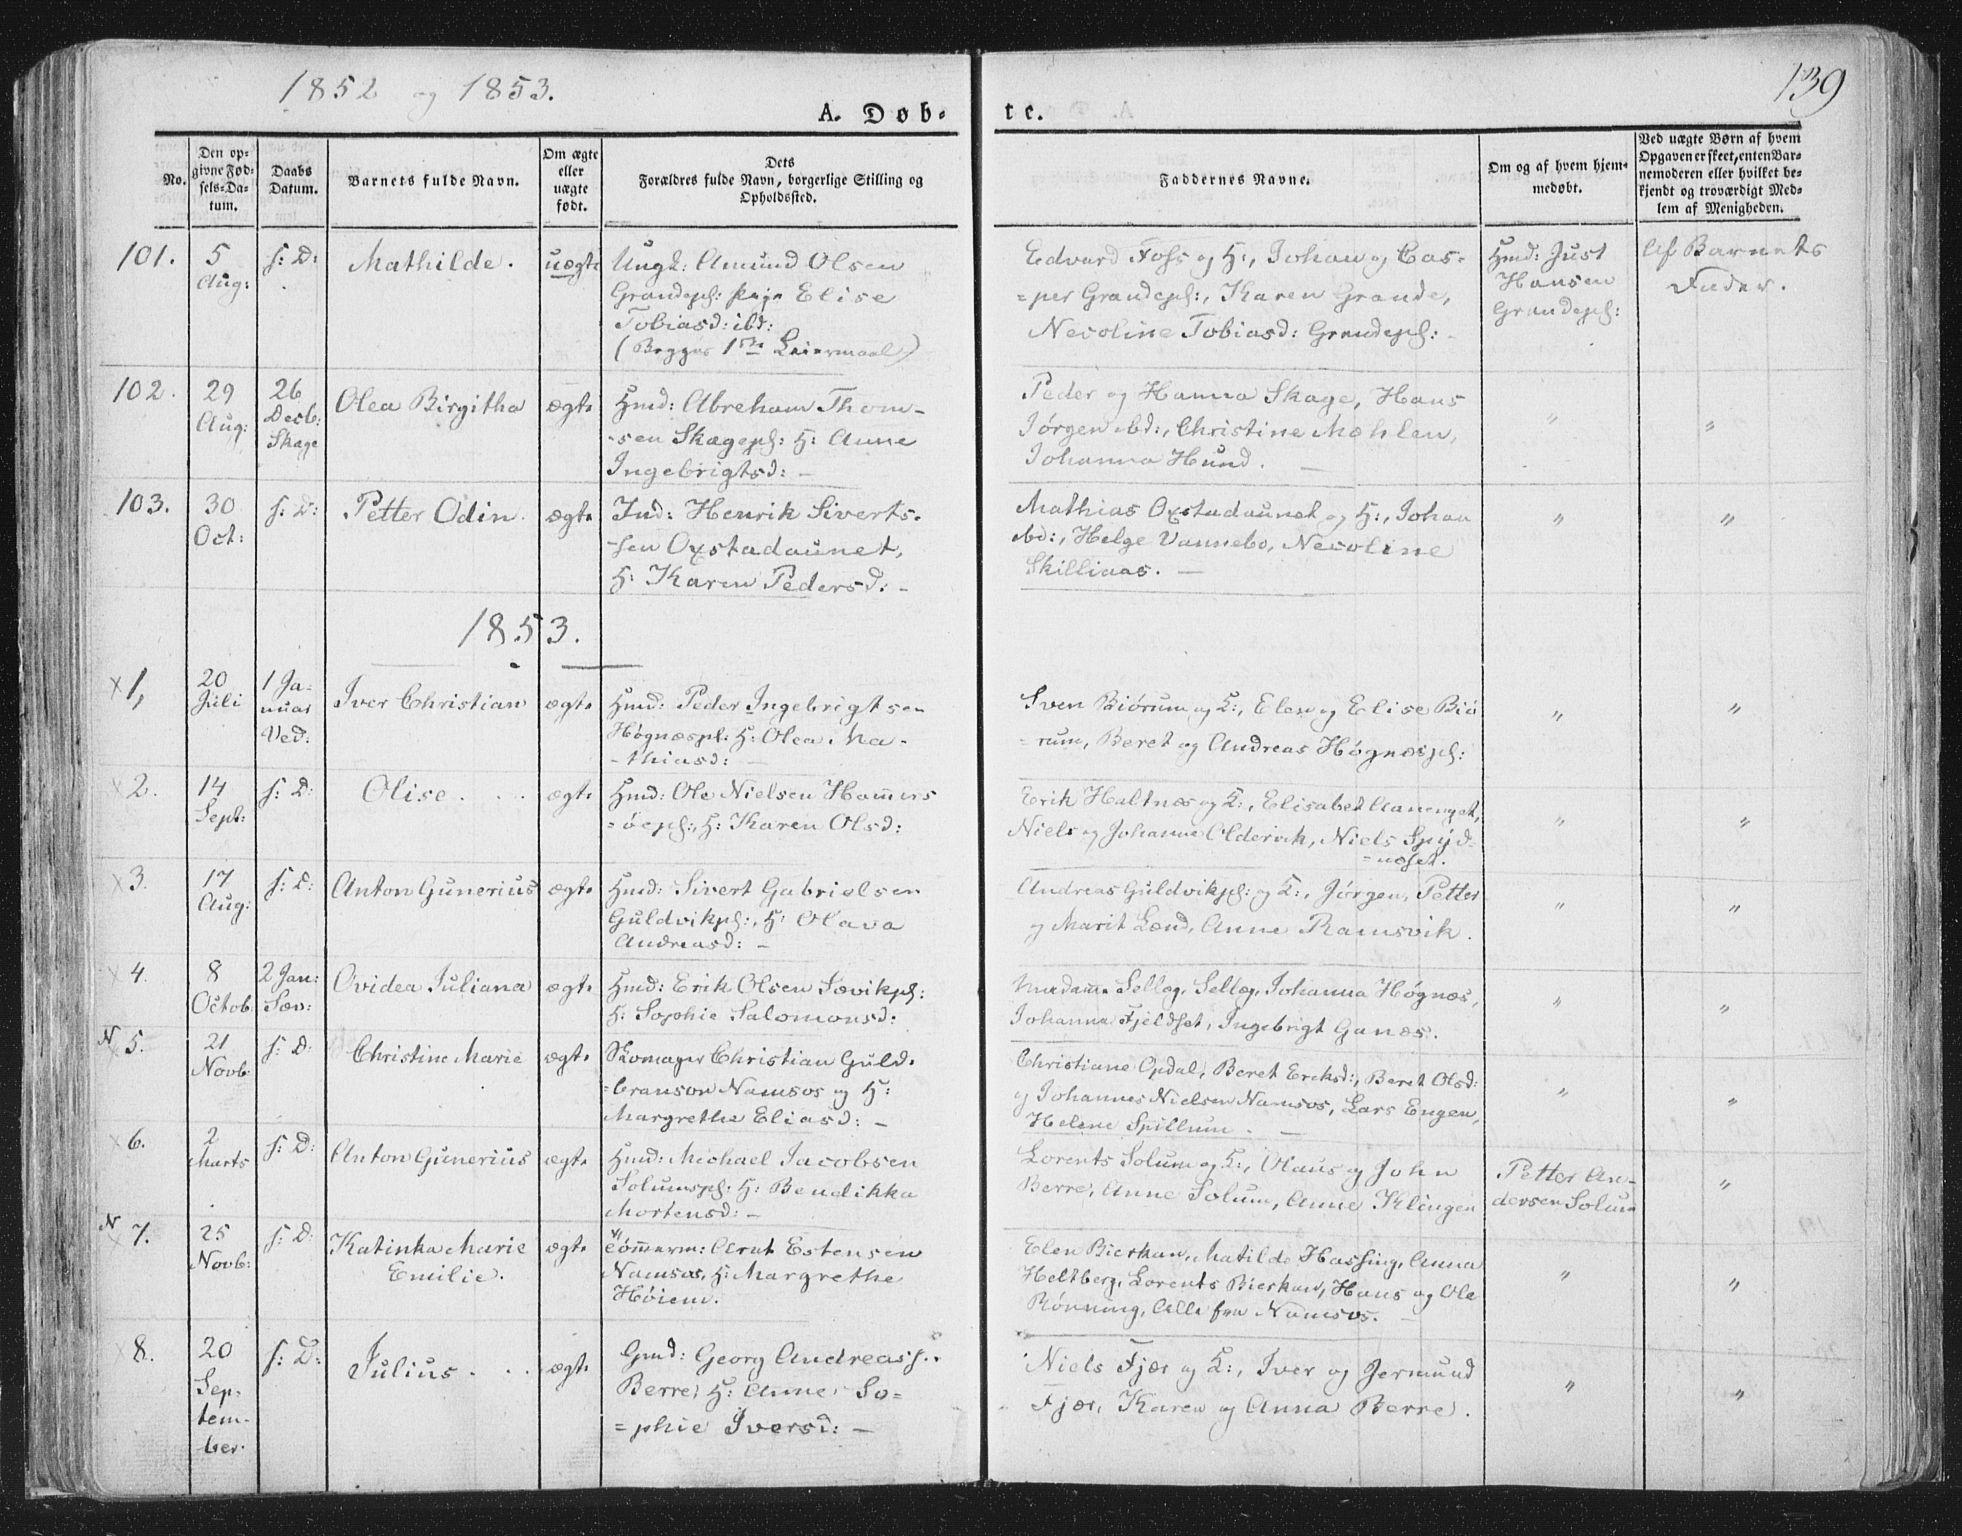 SAT, Ministerialprotokoller, klokkerbøker og fødselsregistre - Nord-Trøndelag, 764/L0551: Ministerialbok nr. 764A07a, 1824-1864, s. 139